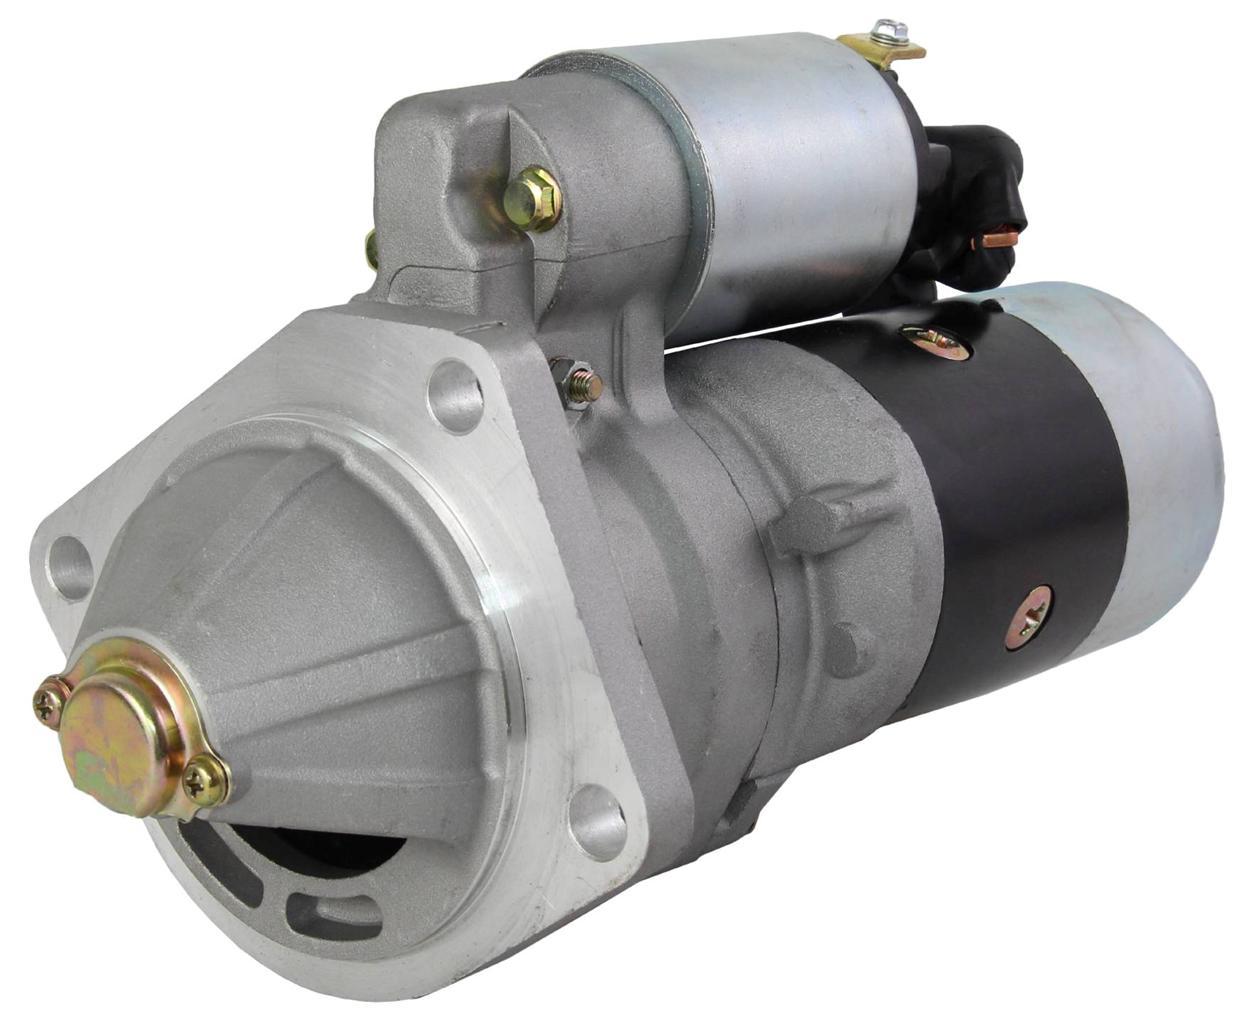 New 24v gear reduction starter motor fits nissan lift for Gear reduction starter motor